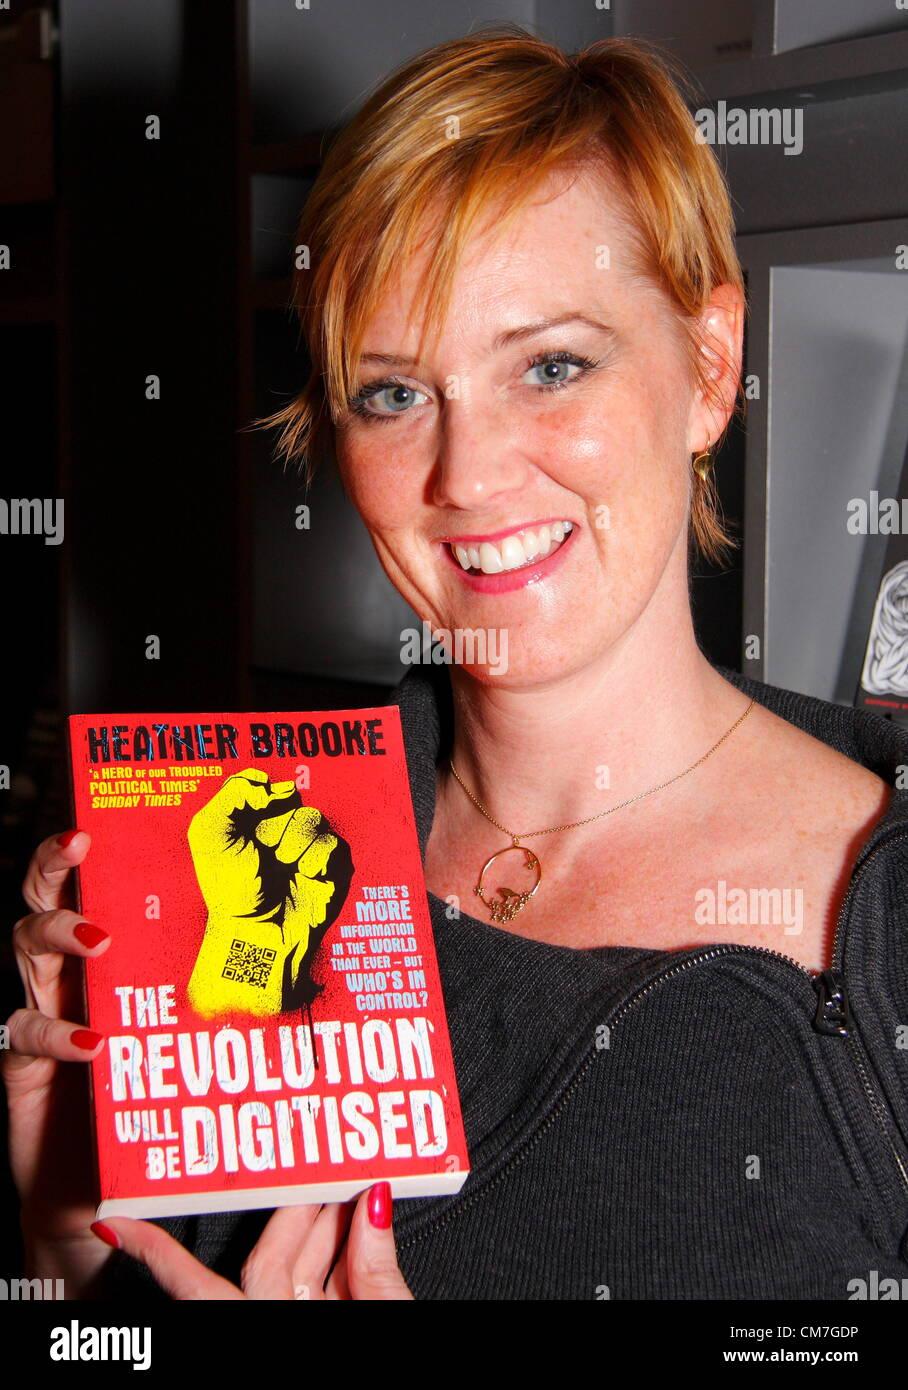 award winning investigative journalist heather brooke